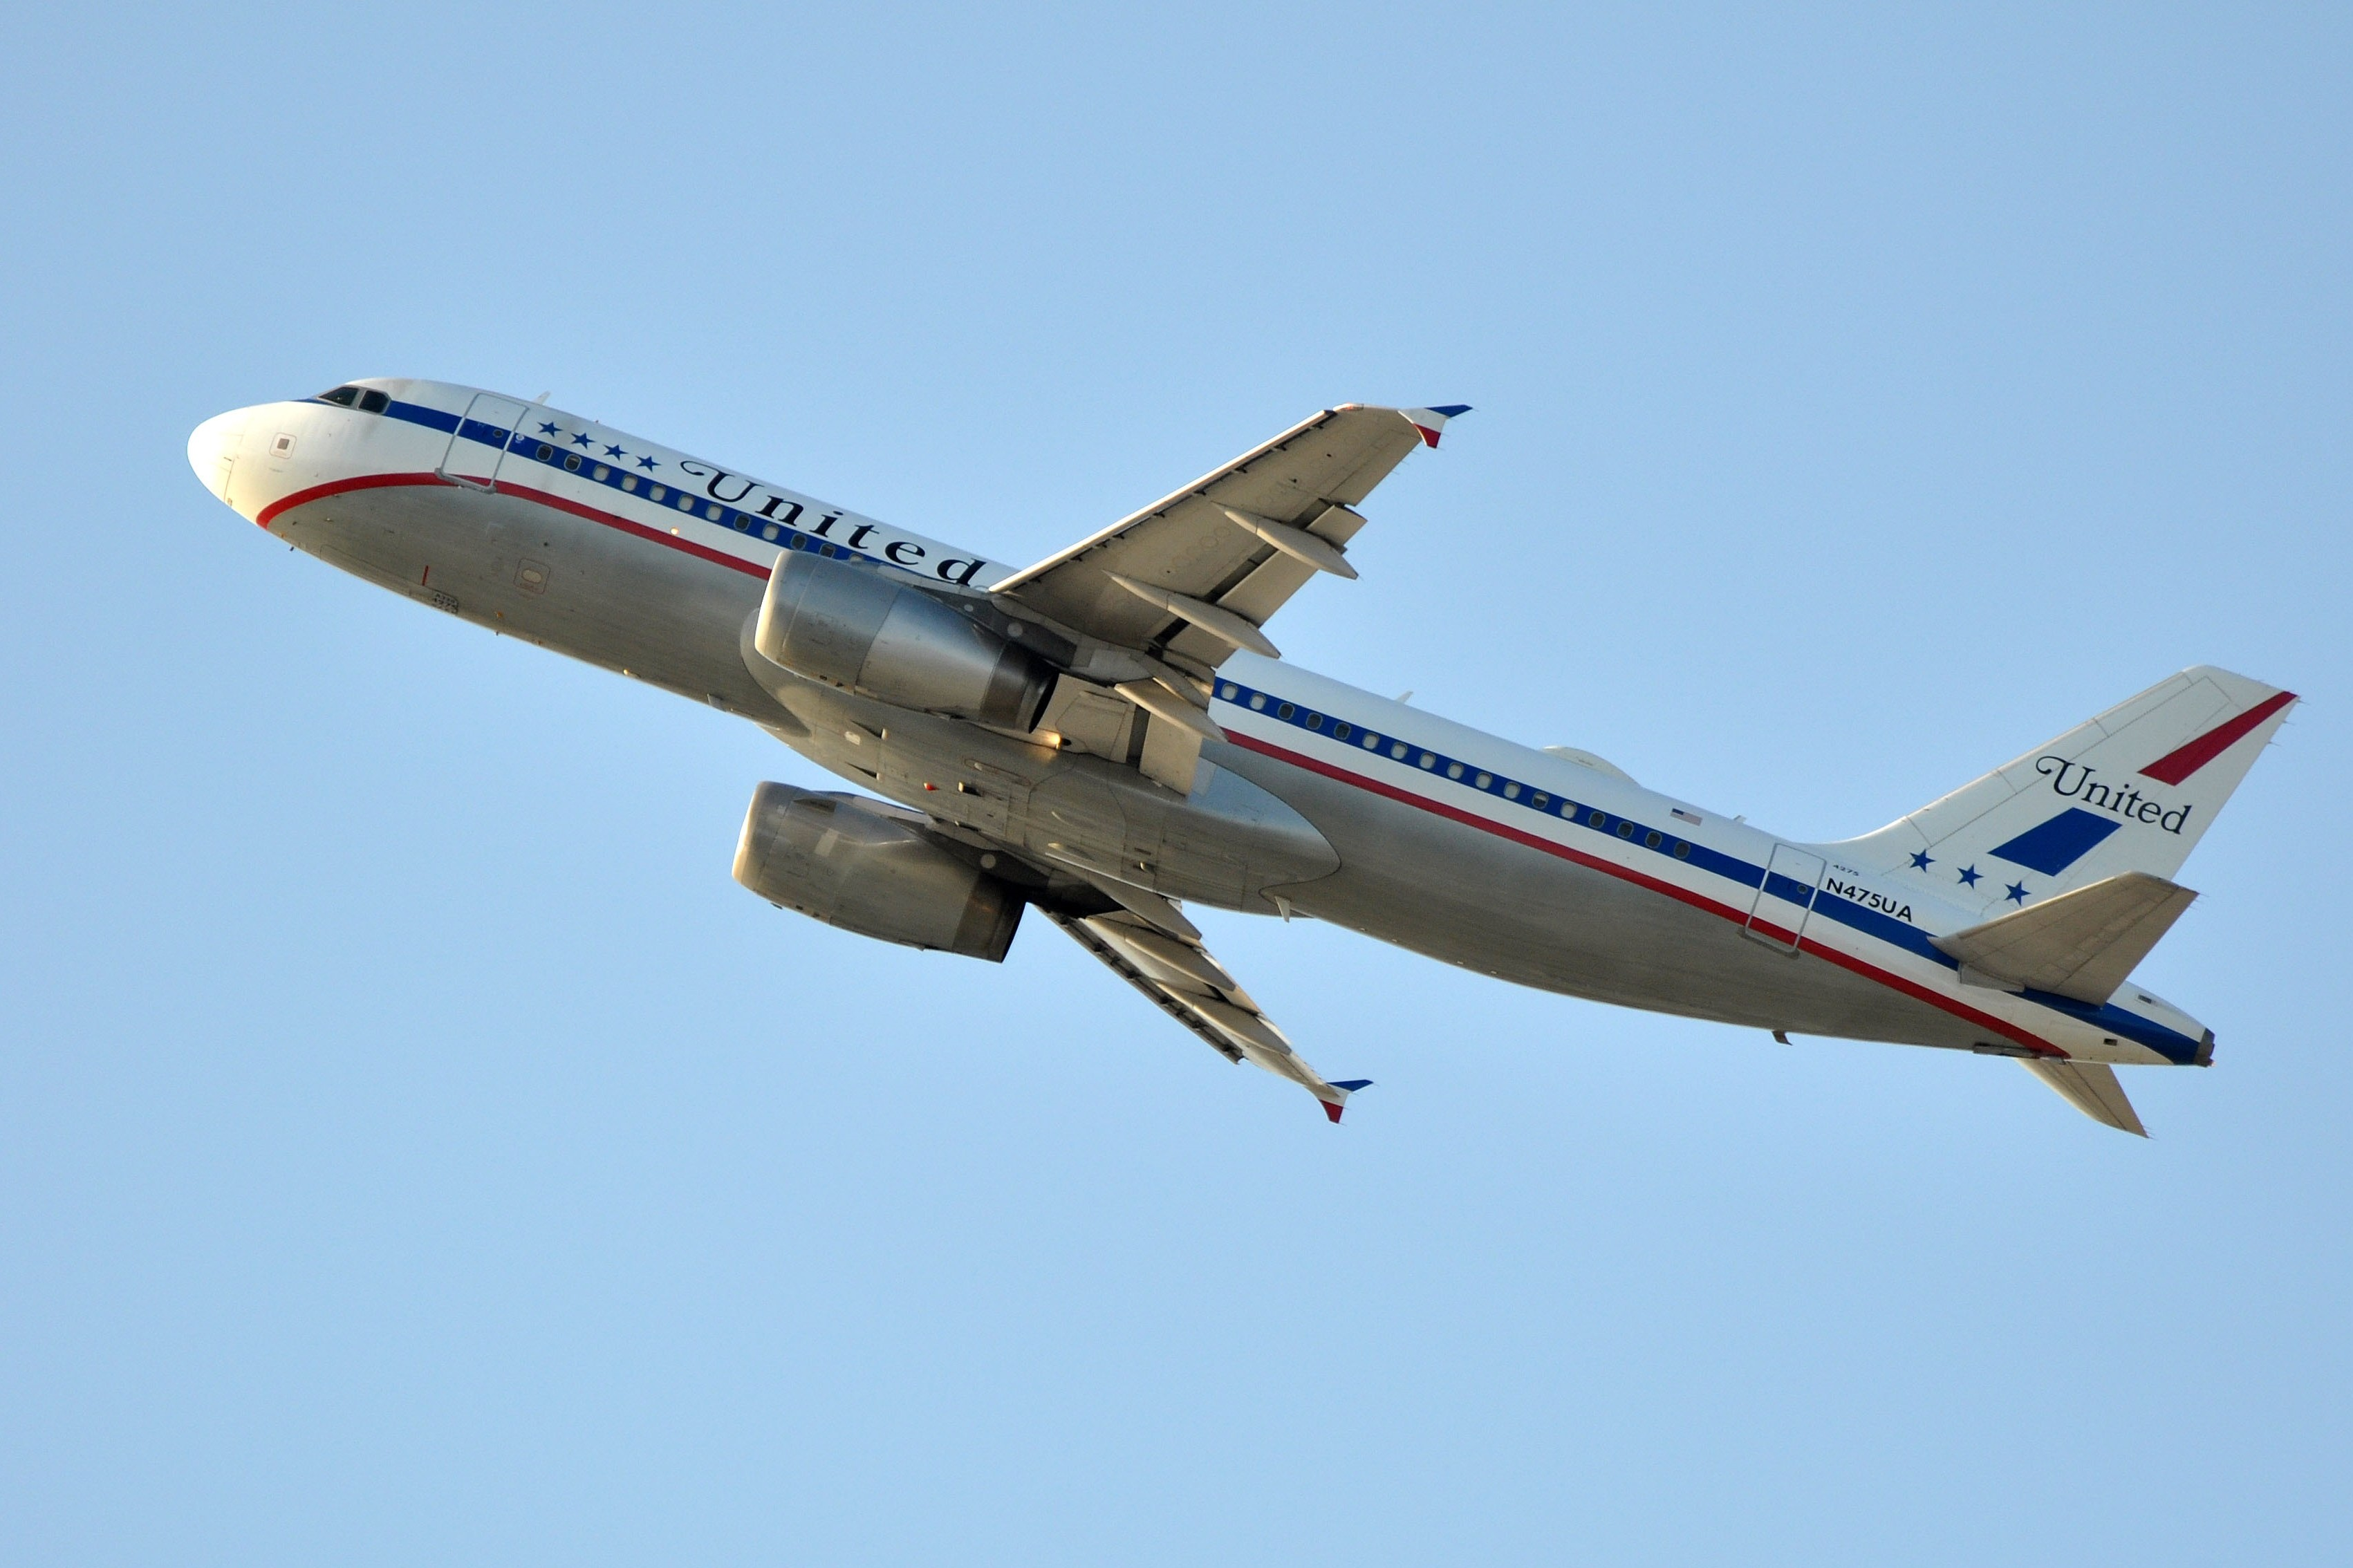 "<p>Фото © Flickr / <a href=""https://www.flickr.com/photos/airlines470/"" target=""_self"">ERIC SALARD</a></p>"